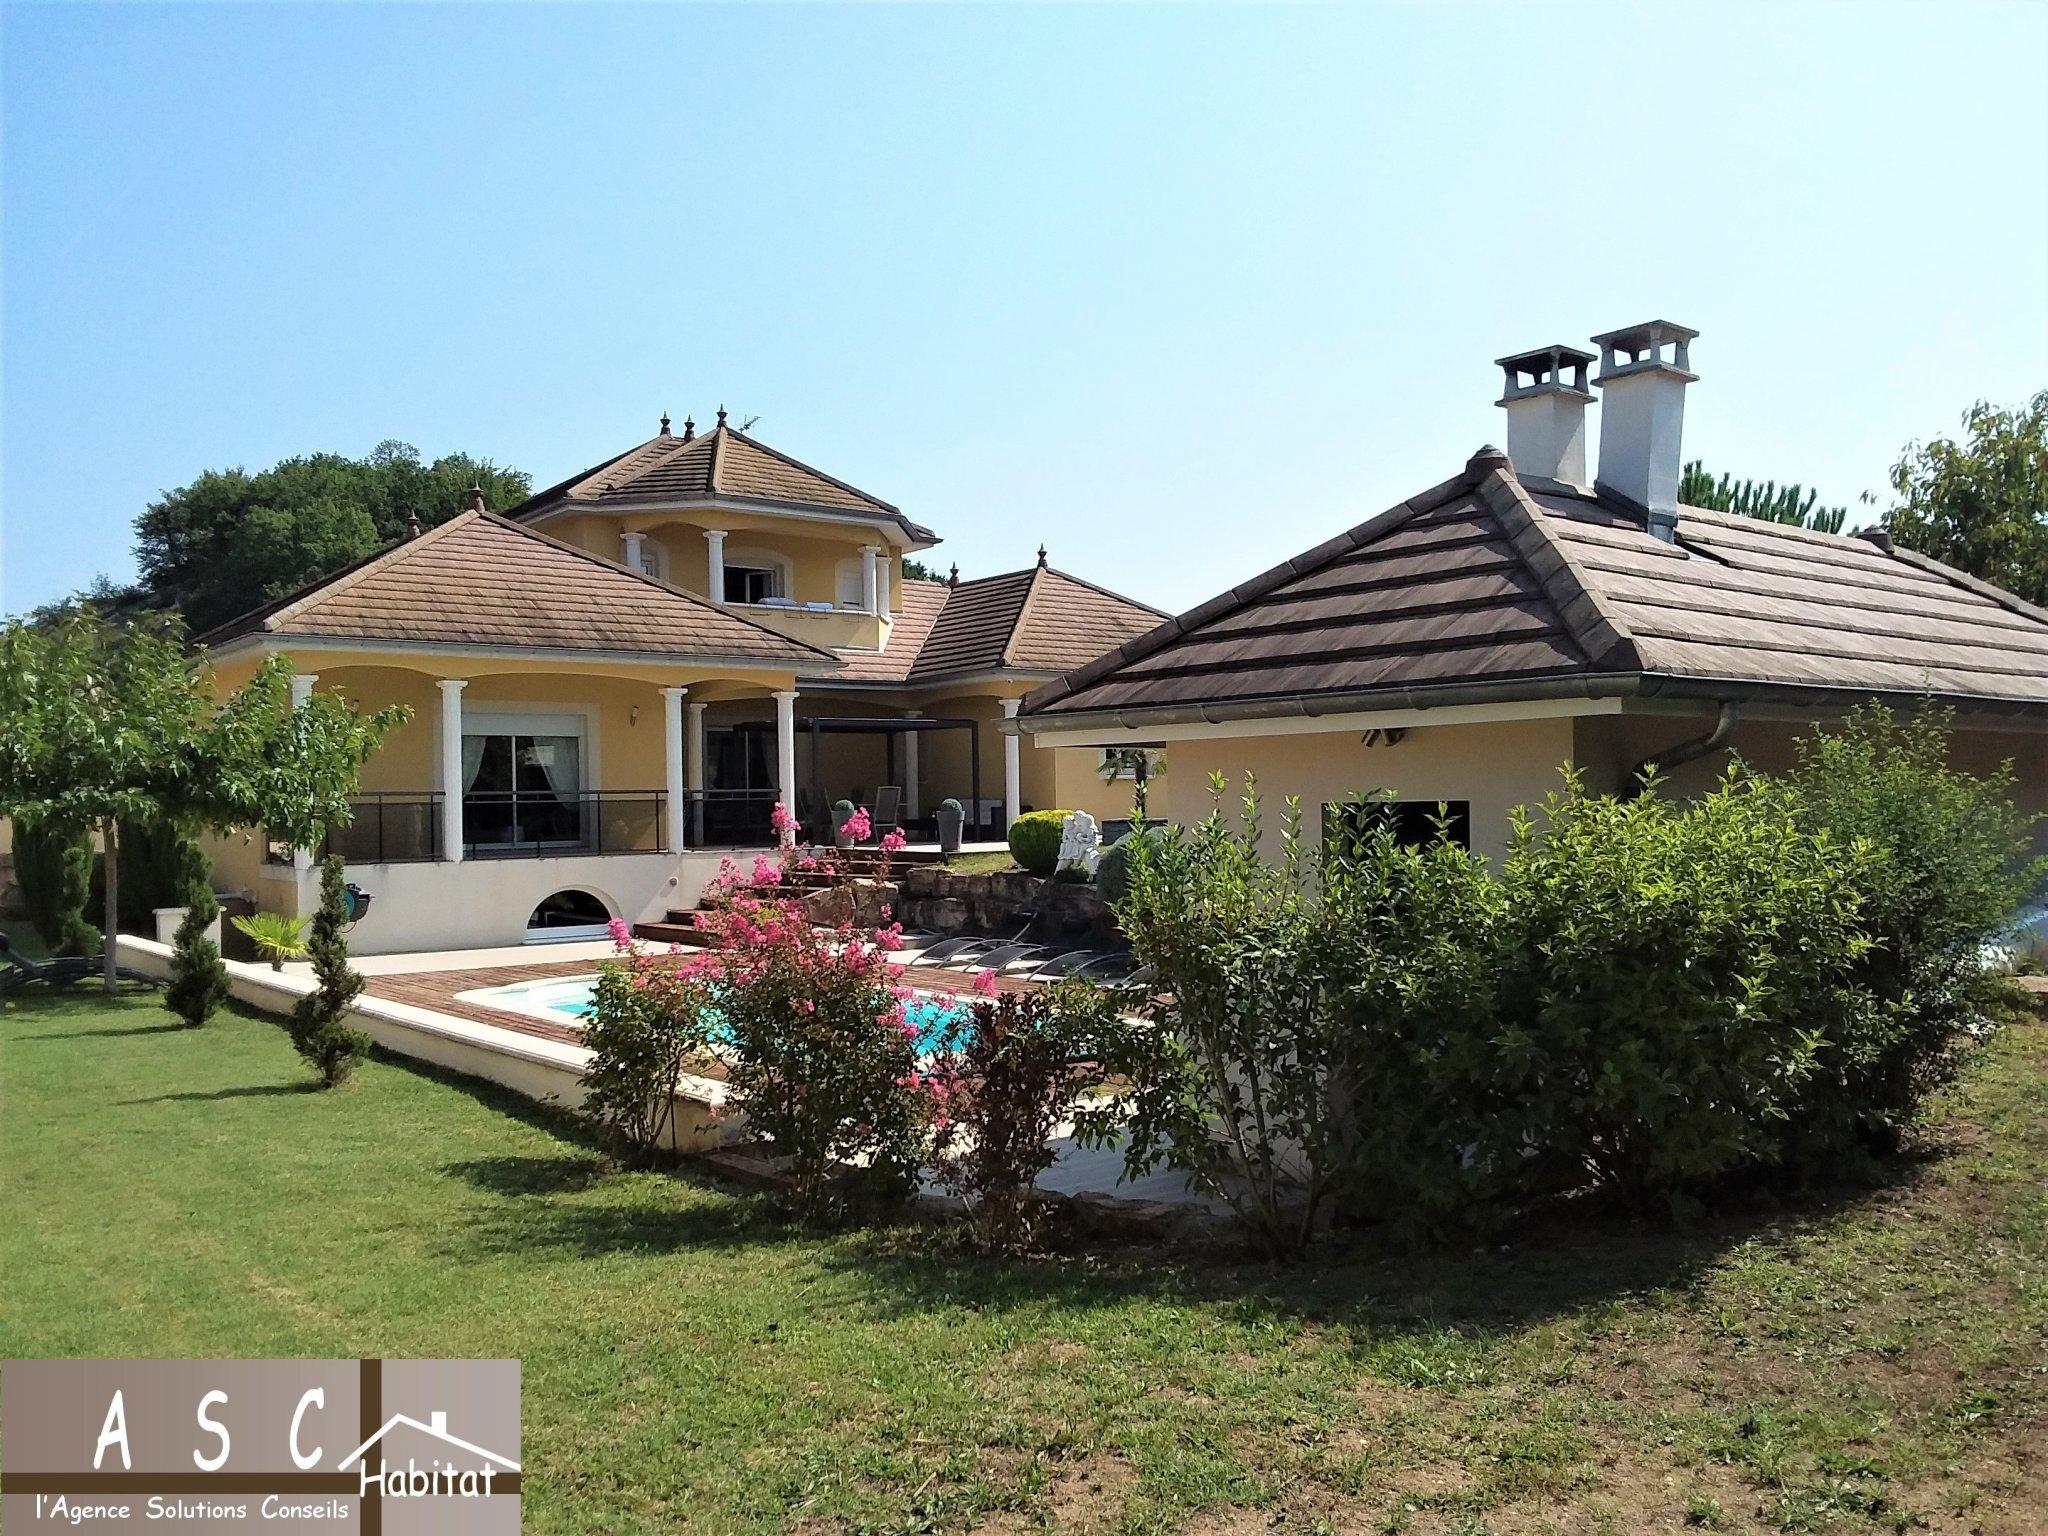 Superbe Villa Piscine Belle Vue Sur Campagne intérieur Piscine St Egreve